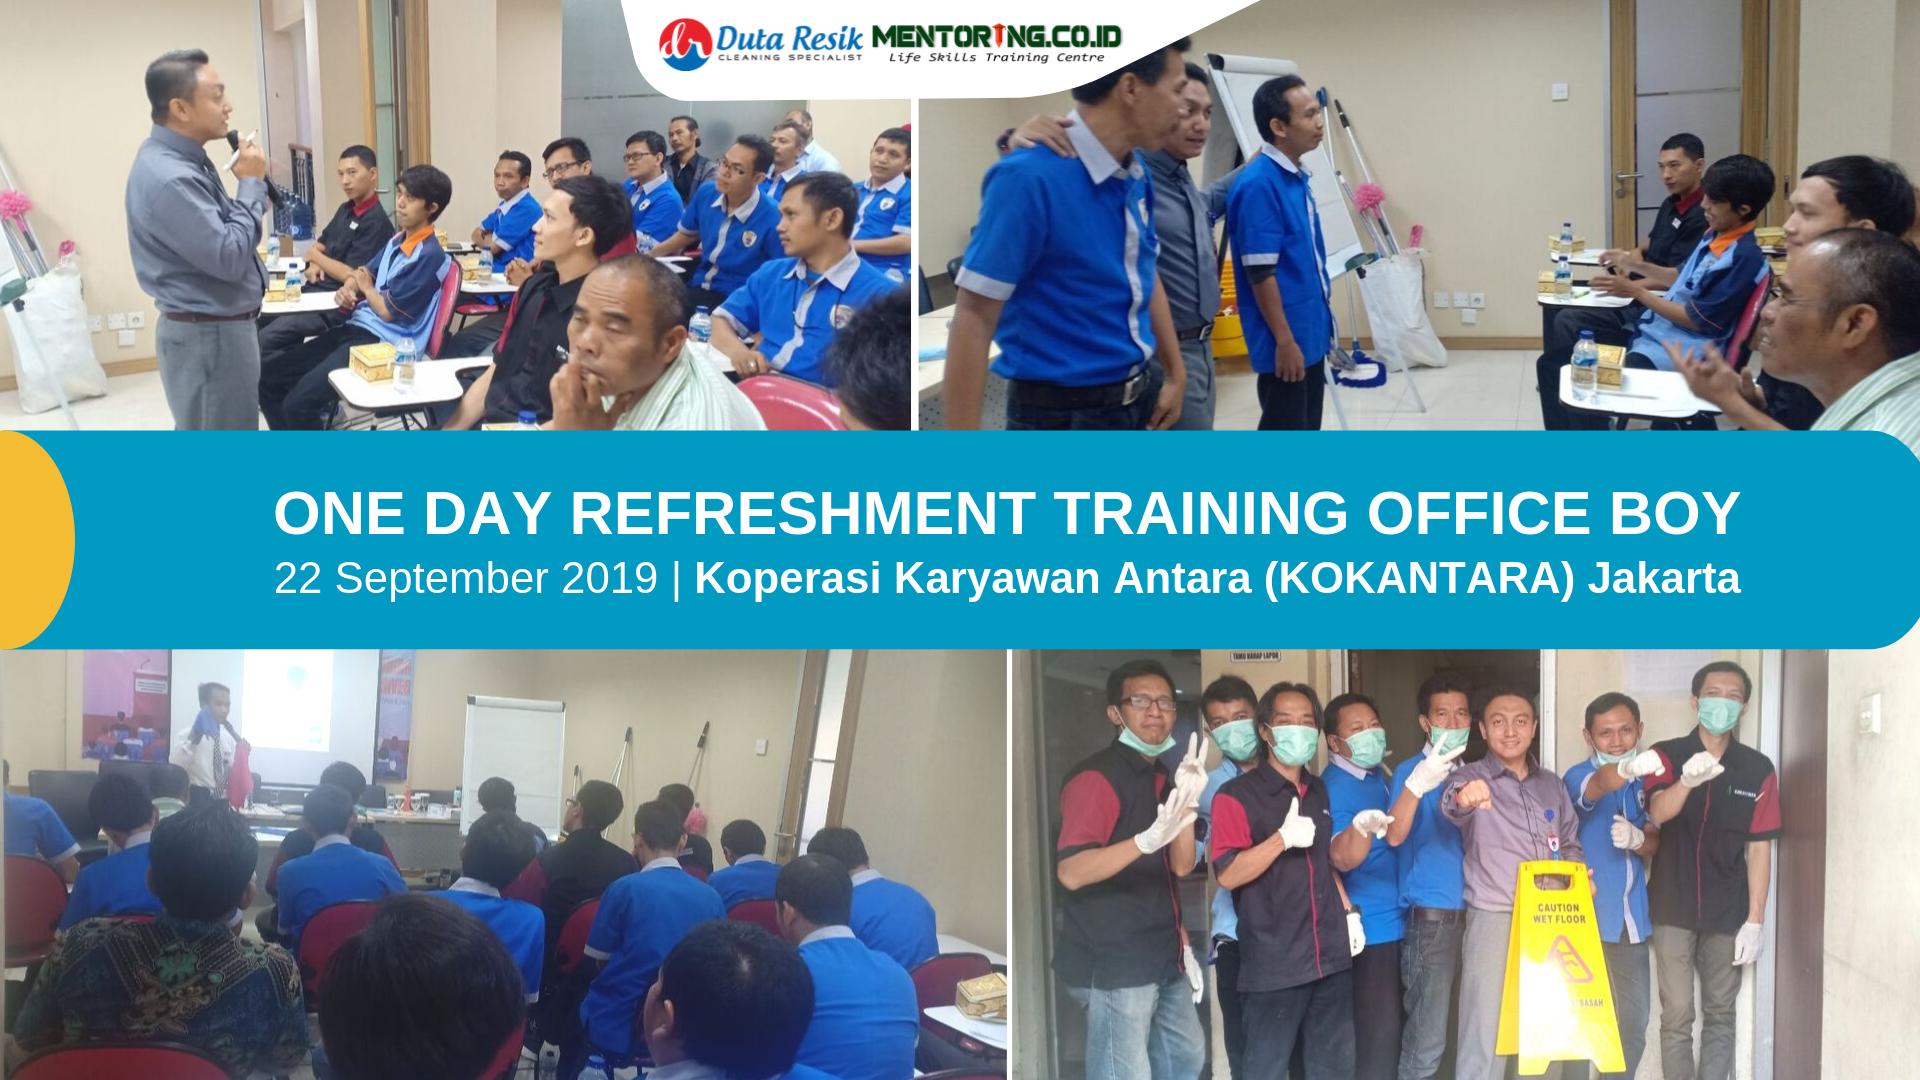 Refreshment Training office boy Kokantara Jakarta